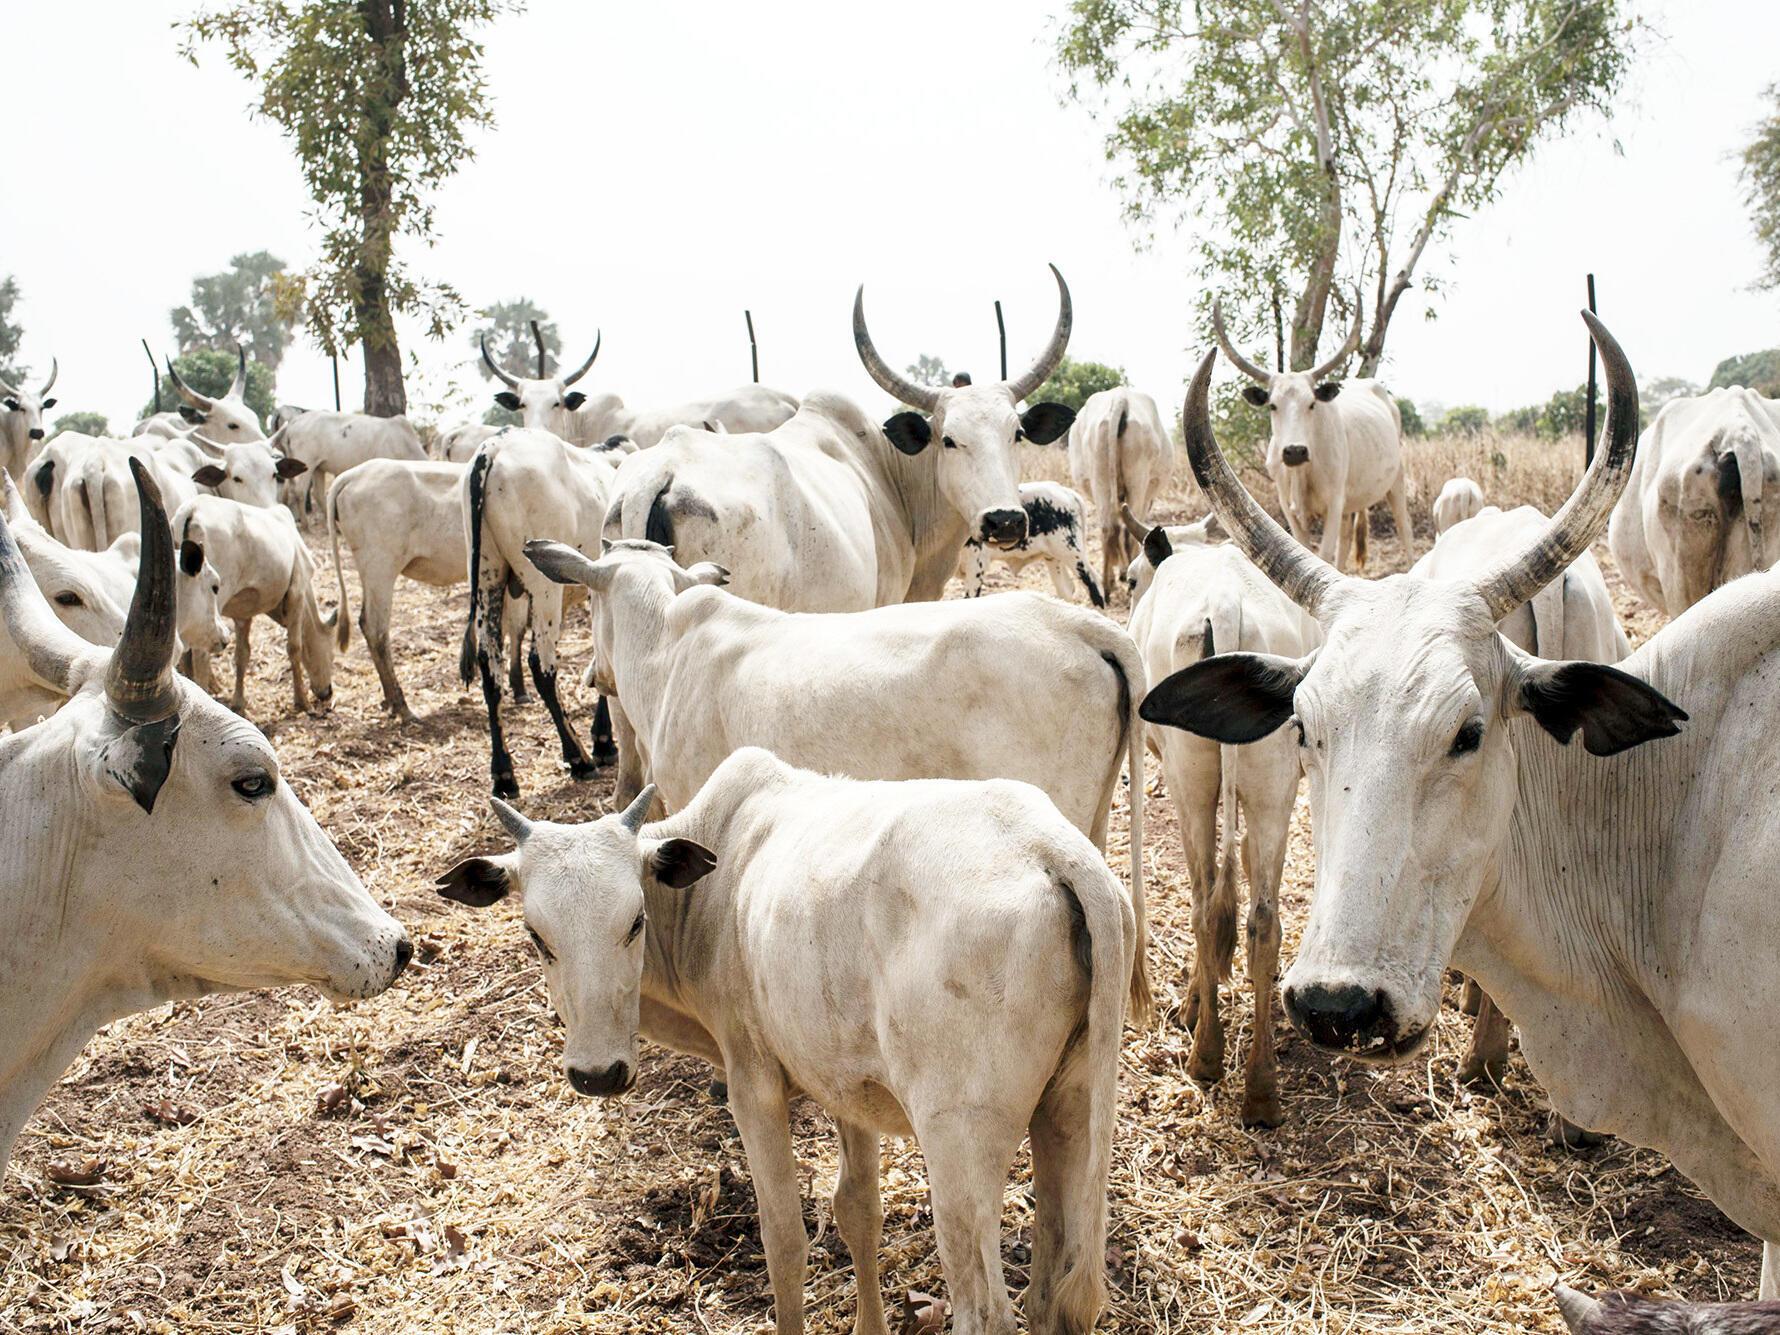 nigerian-cattle-0856c302bf4a35ab40ccb4bb03dd27bd7d55ccbc